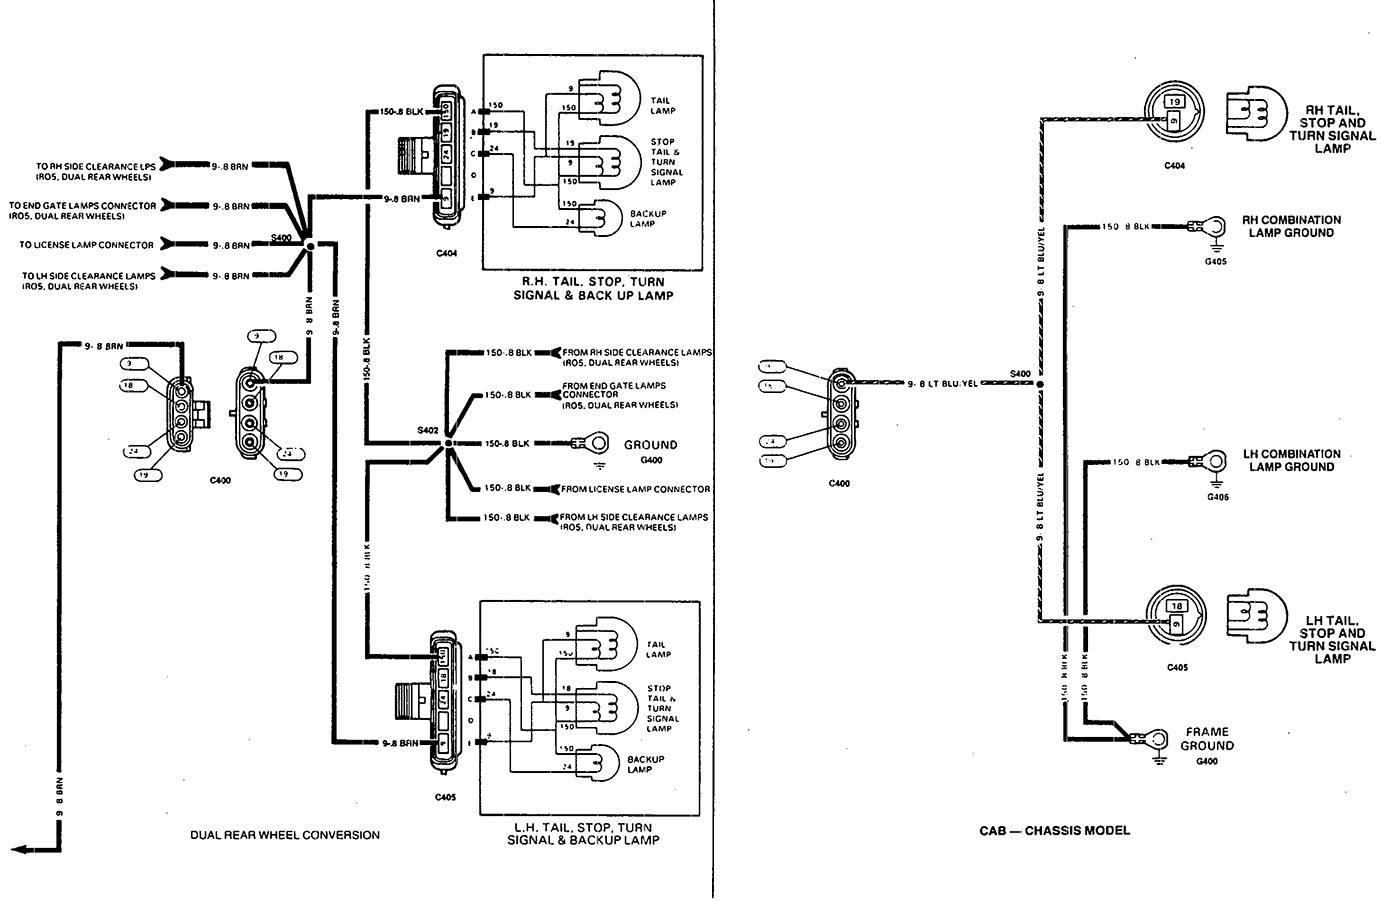 Trailer Light Wiring Harness Diagram - Wiring Diagrams Hubs - 4 Wire Trailer Wiring Diagram